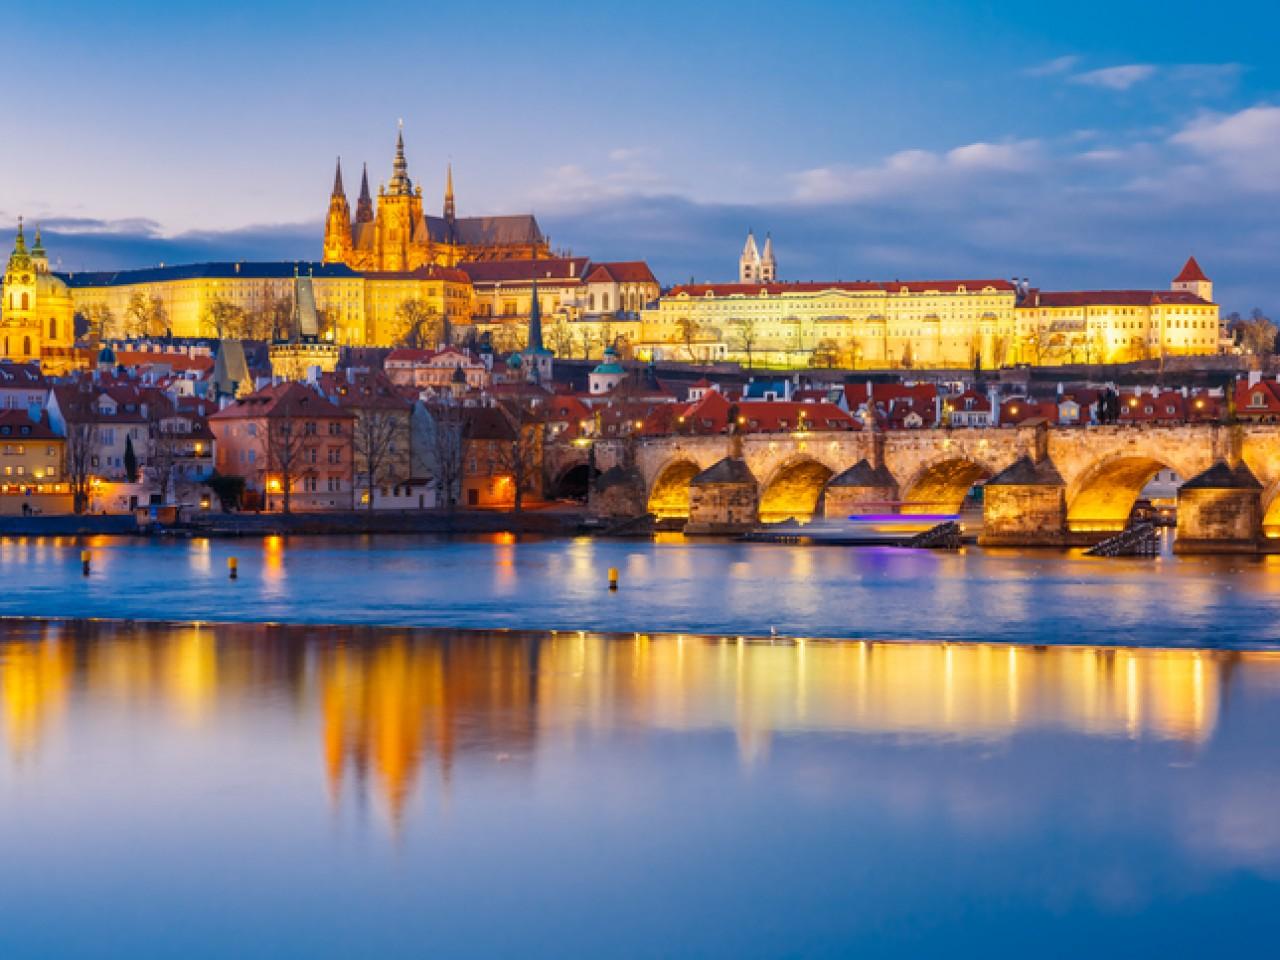 Andrea Bocelli Concert Break to Prague, 27 May 2021